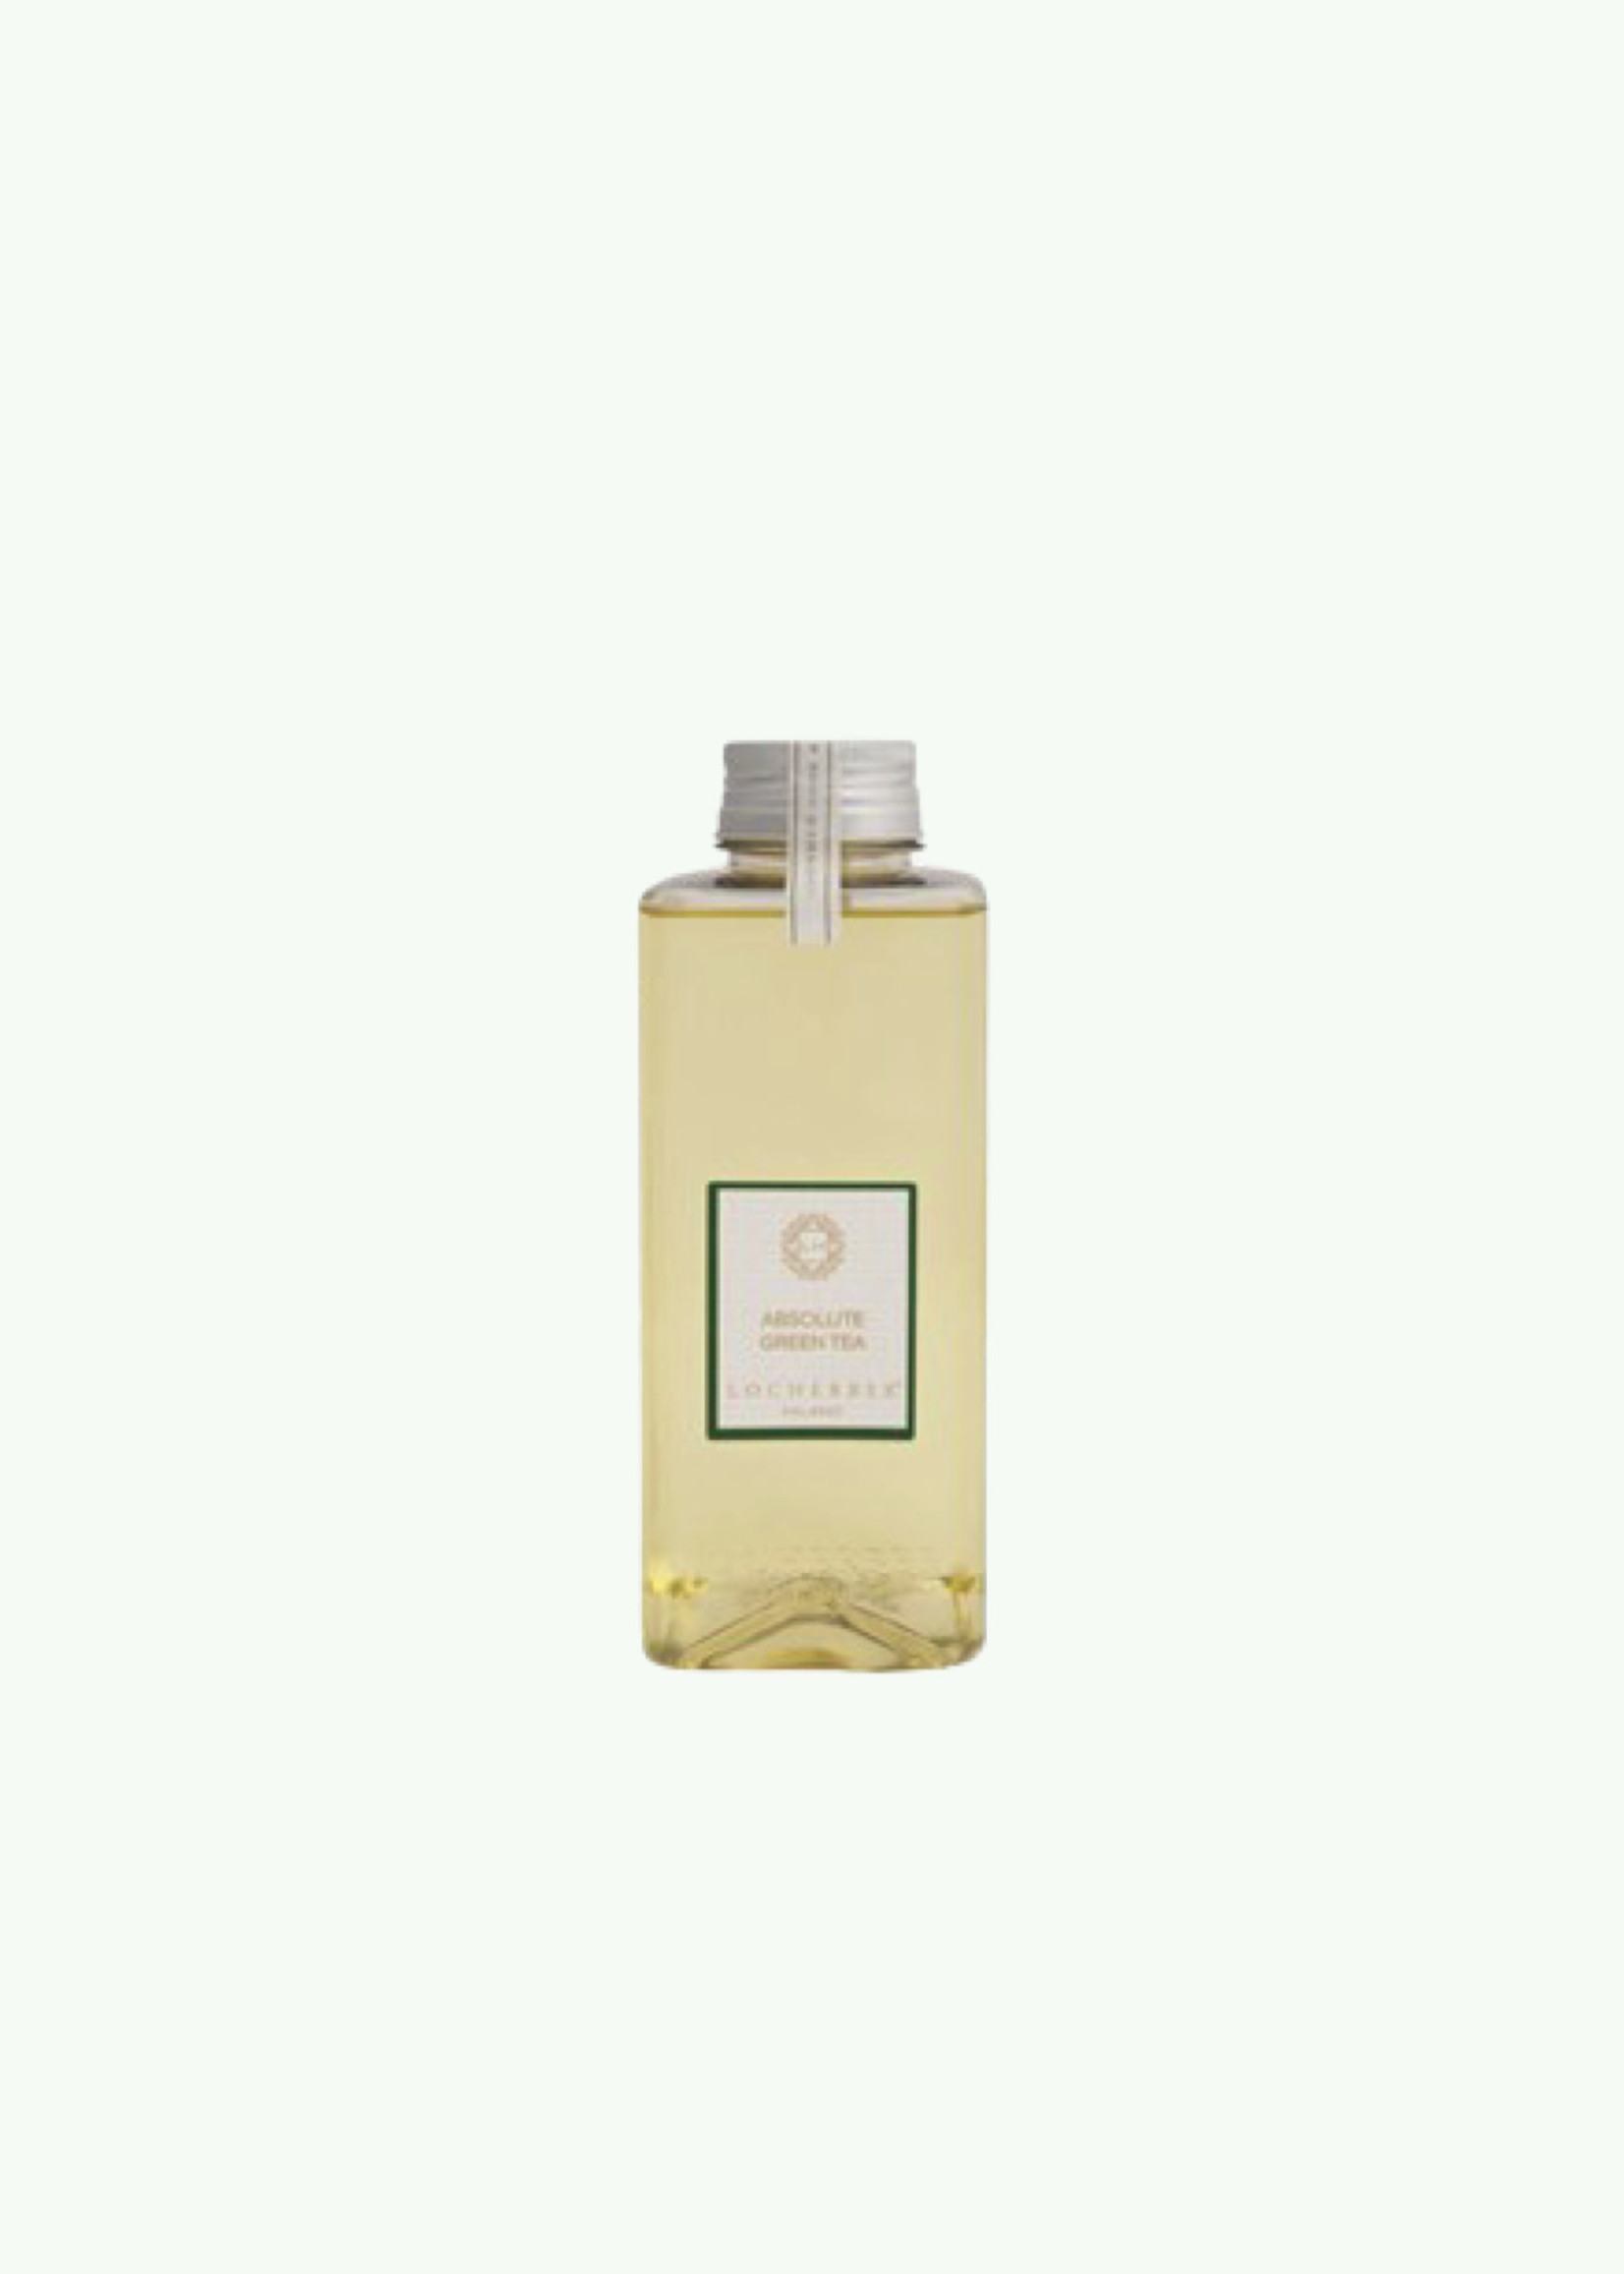 Locherber Locherber - Absolute Green Tea - Refill bottle 250 ml